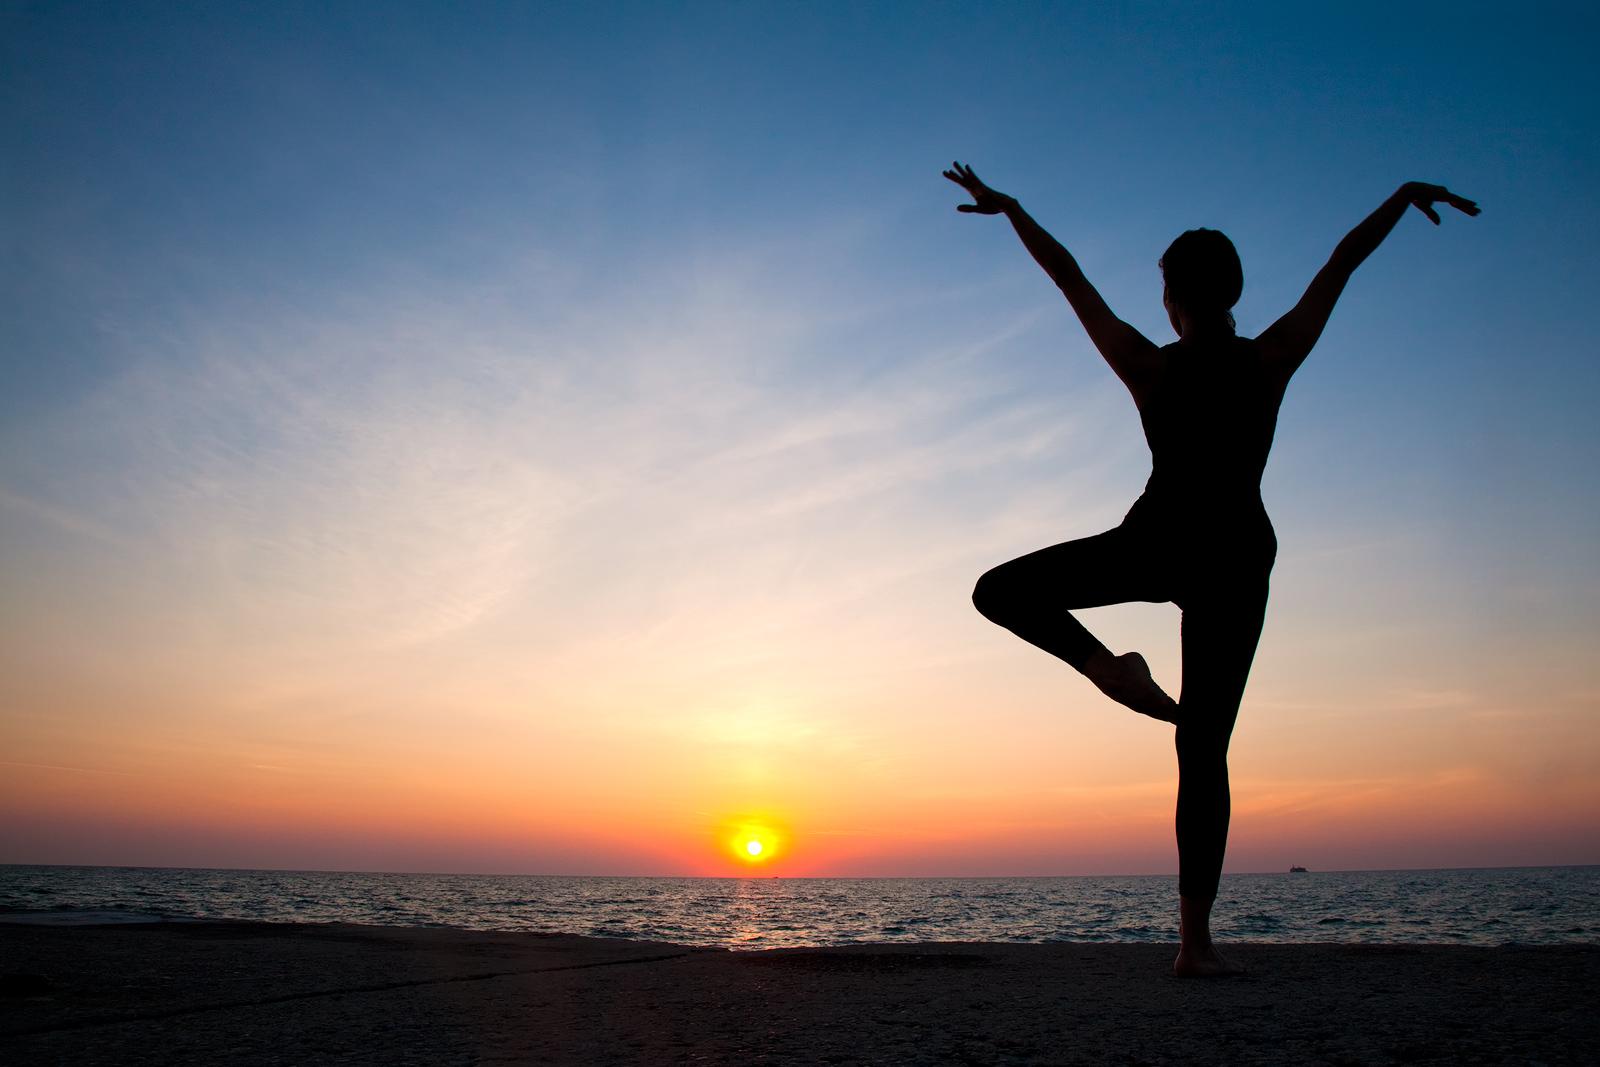 agility,america,ballet,chicago,dance,dancer,exercise,flexibility,horizontal,il,illinois,lake,lake michigan,midwest,morning,north america,silhouette,sunrise,united states,us,usa,yoga, photo